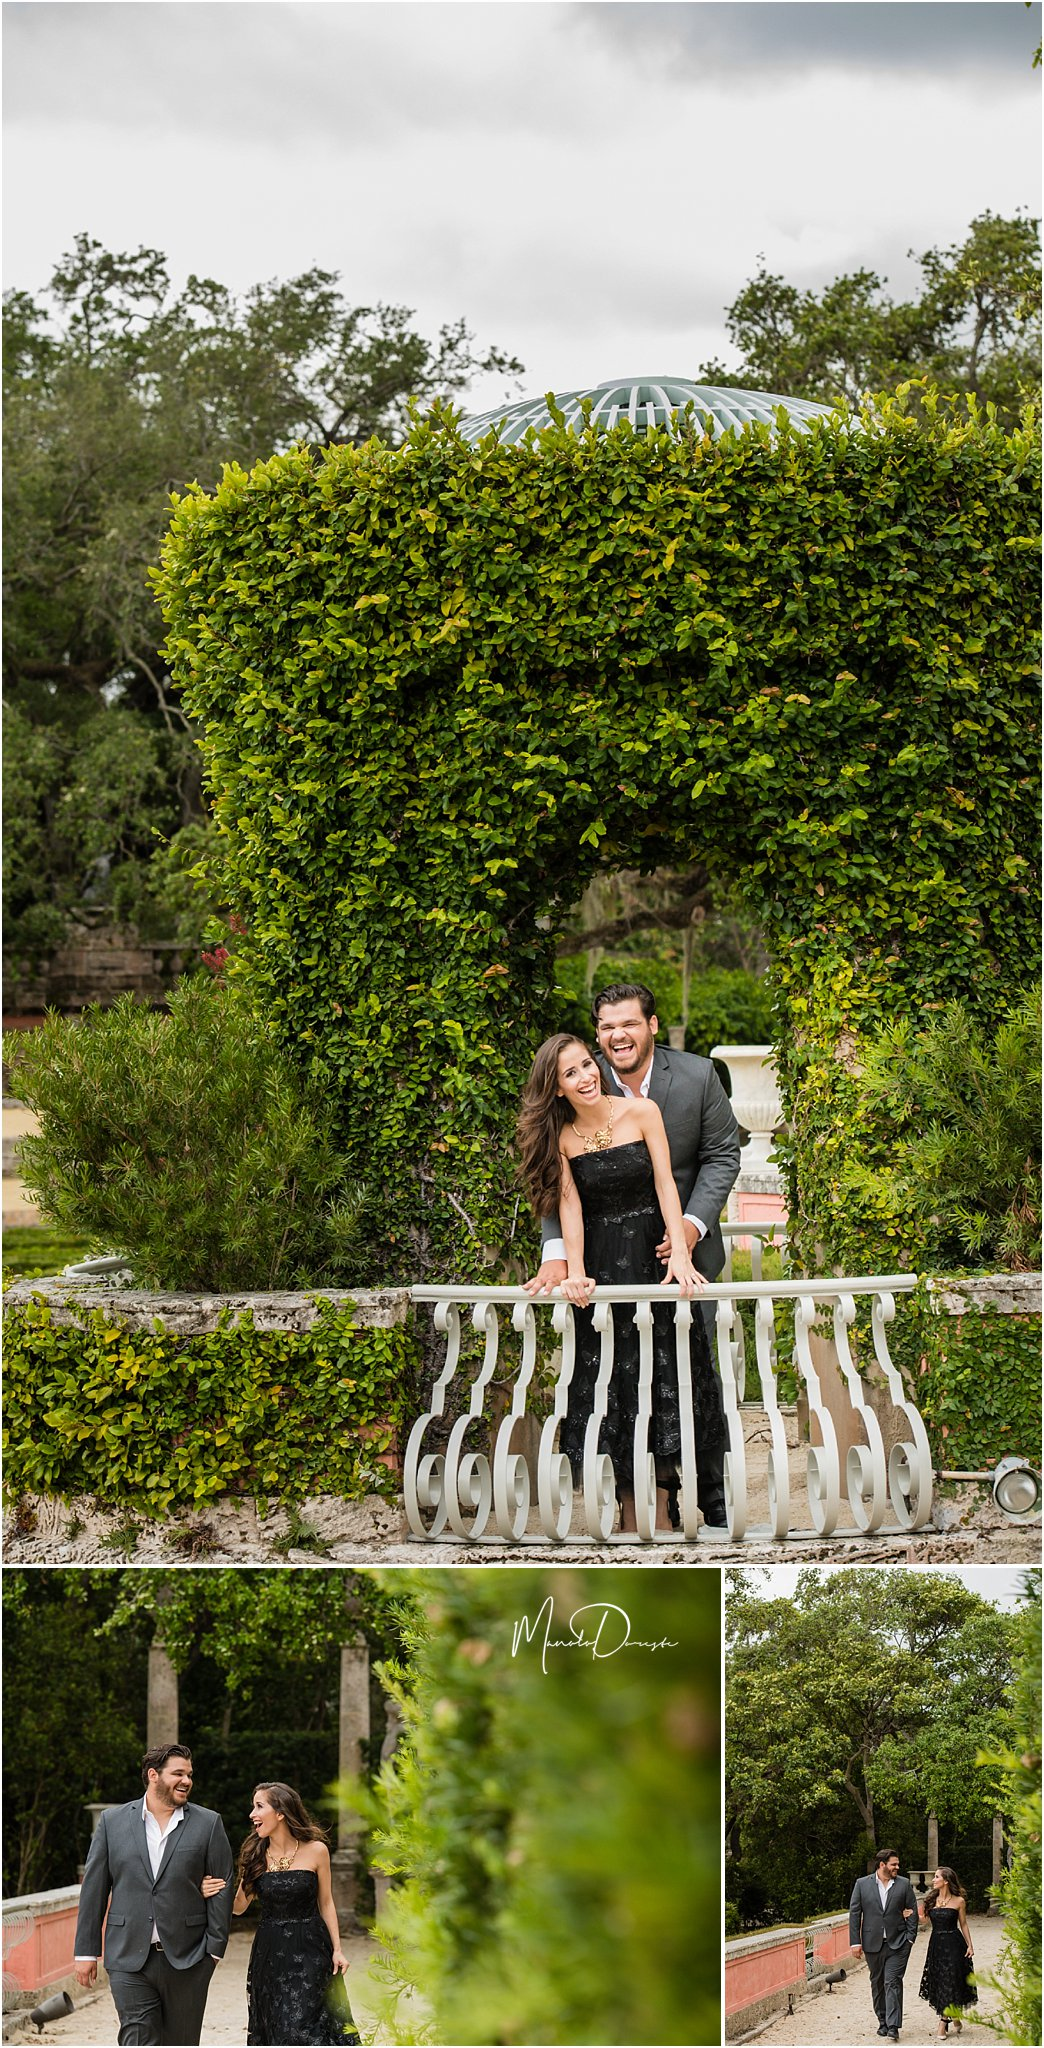 0588_ManoloDoreste_InFocusStudios_Wedding_Family_Photography_Miami_MiamiPhotographer.jpg